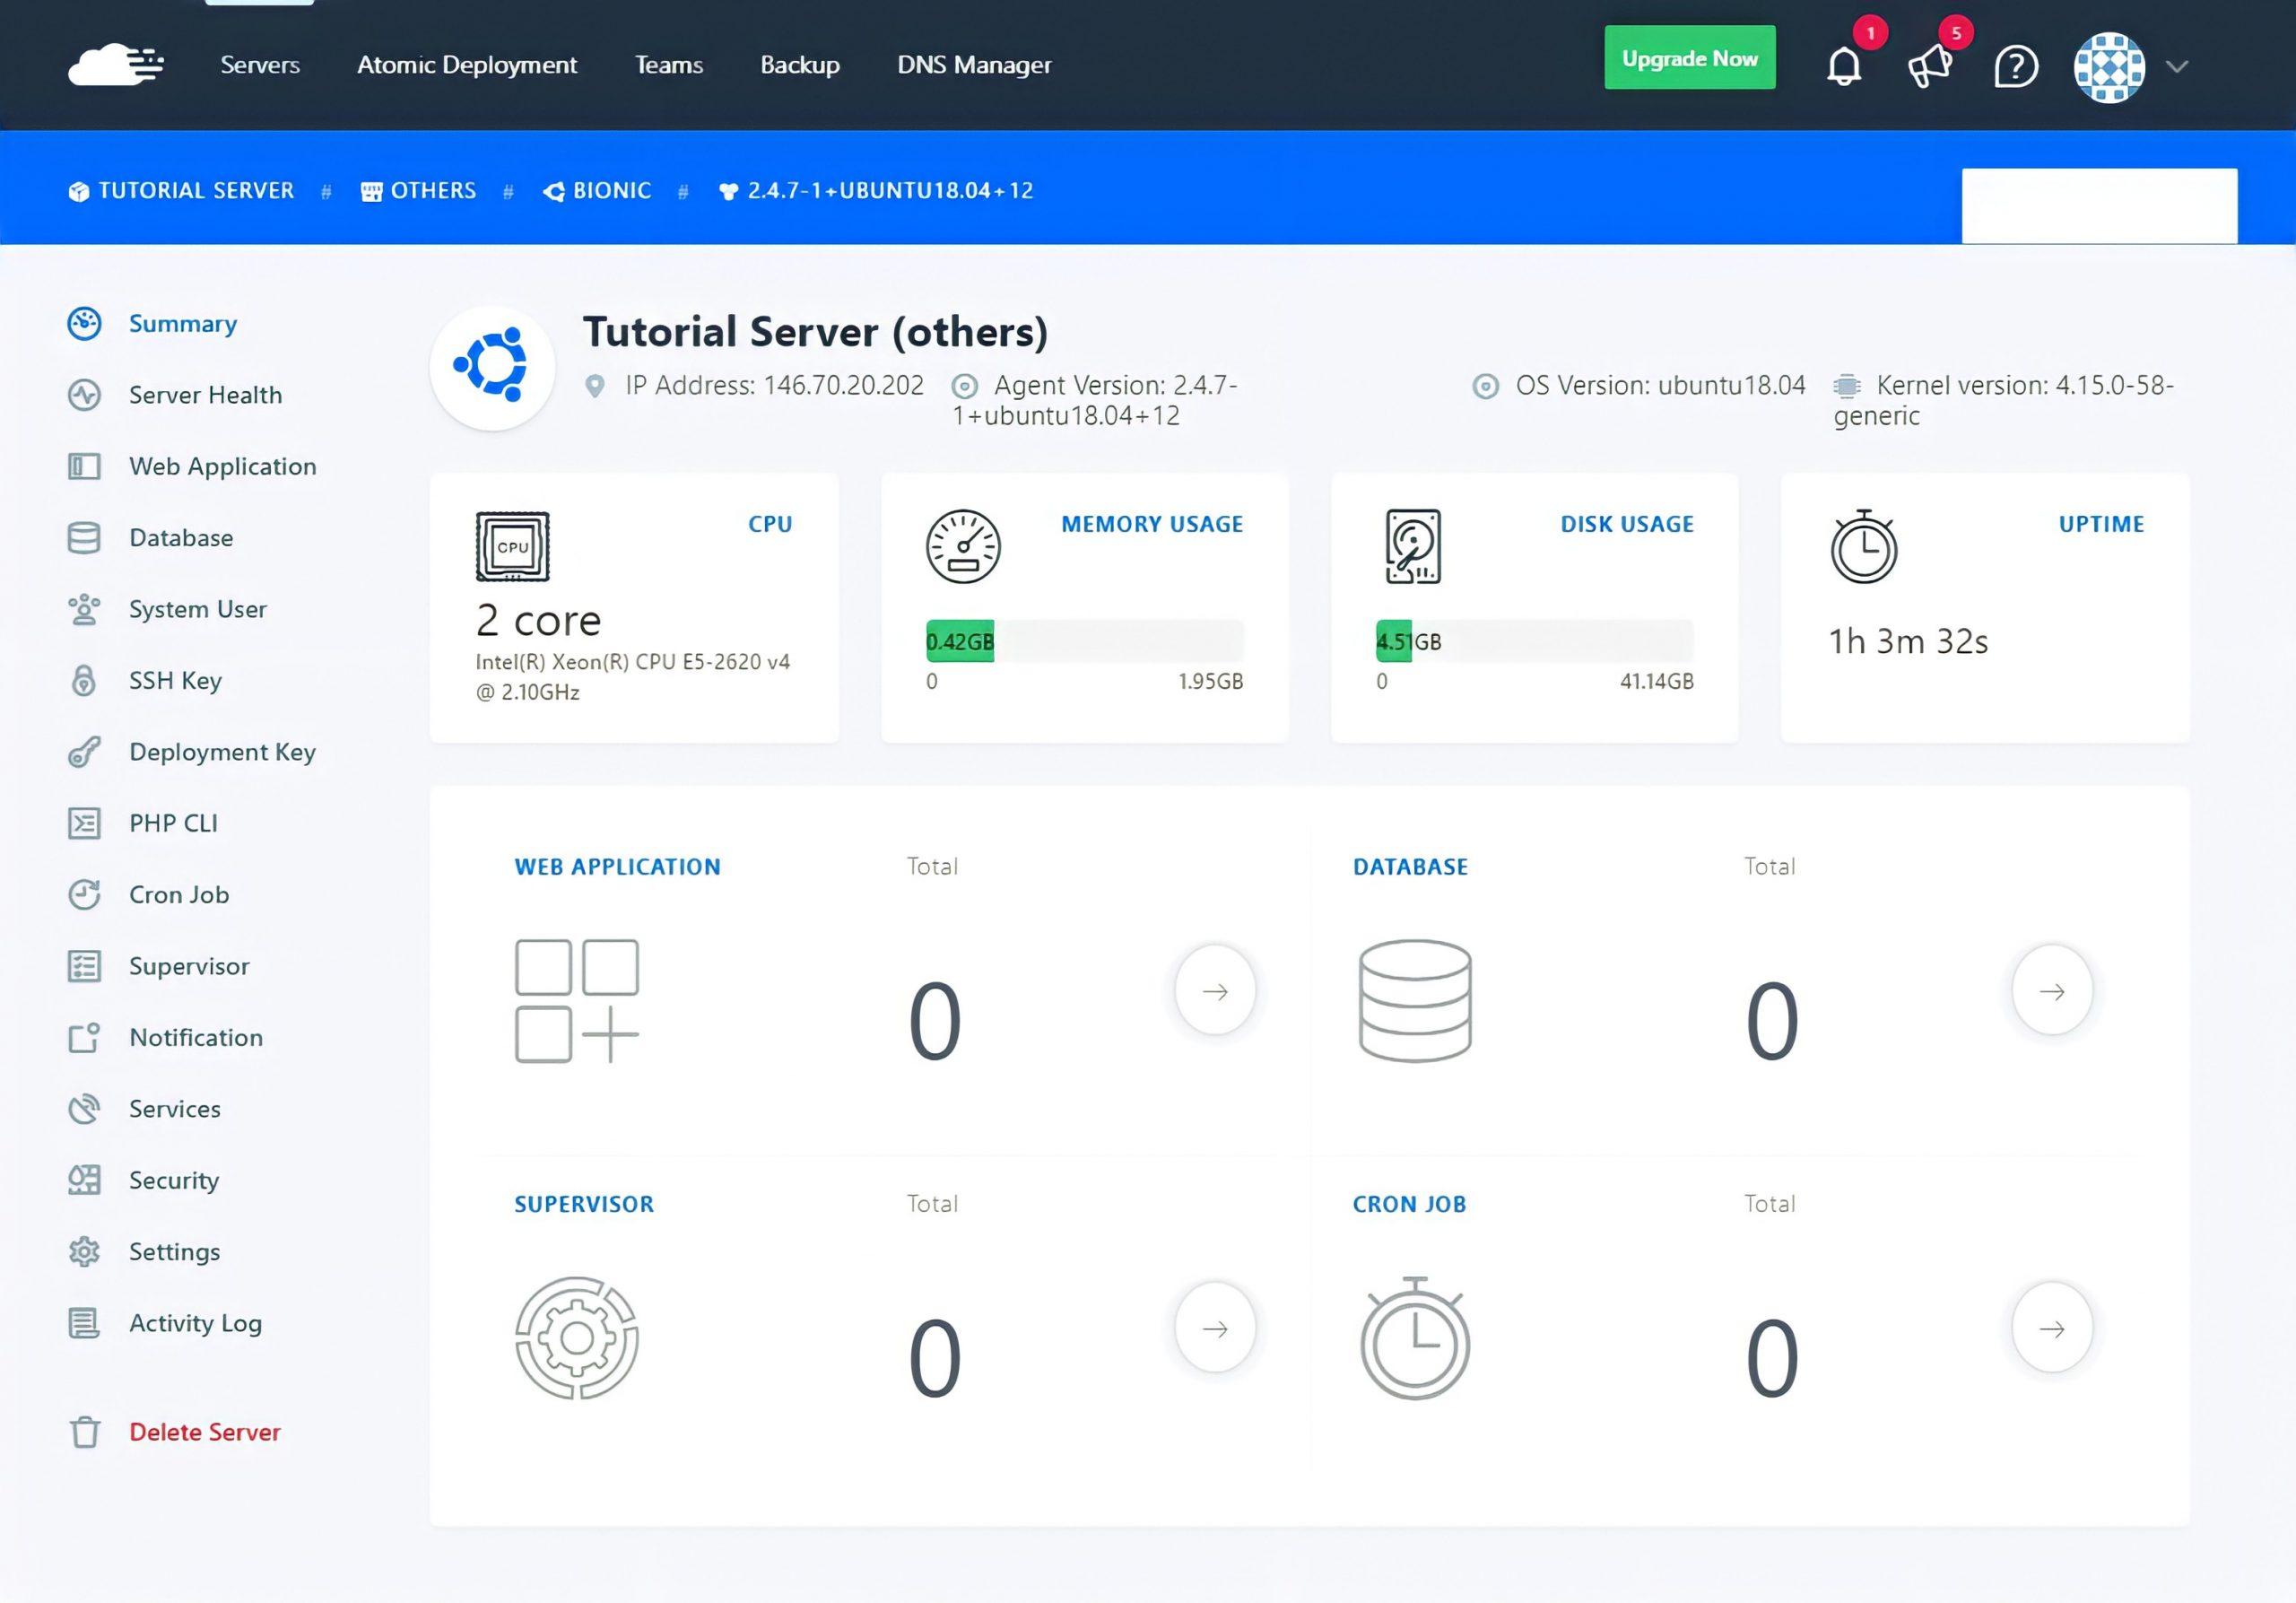 10 RunCloud Server Environment 1 scaled